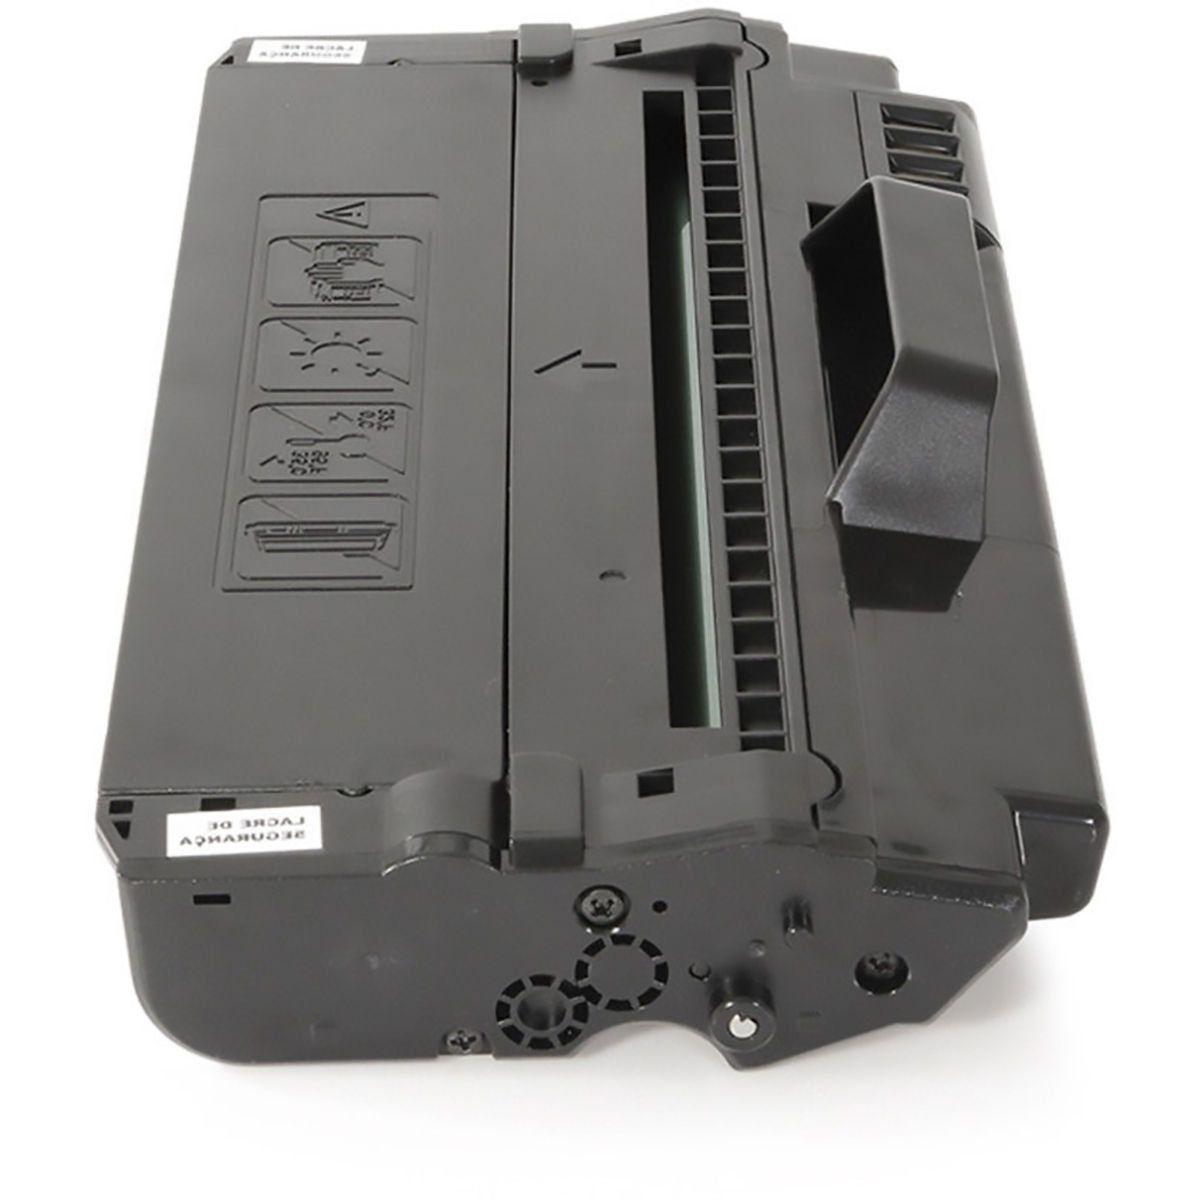 Compatível: Toner ML1630 D1630A para Samsung SCX4500 ML-1630 ML-1631 SCX-4500 ML1631 / Preto / 2.000